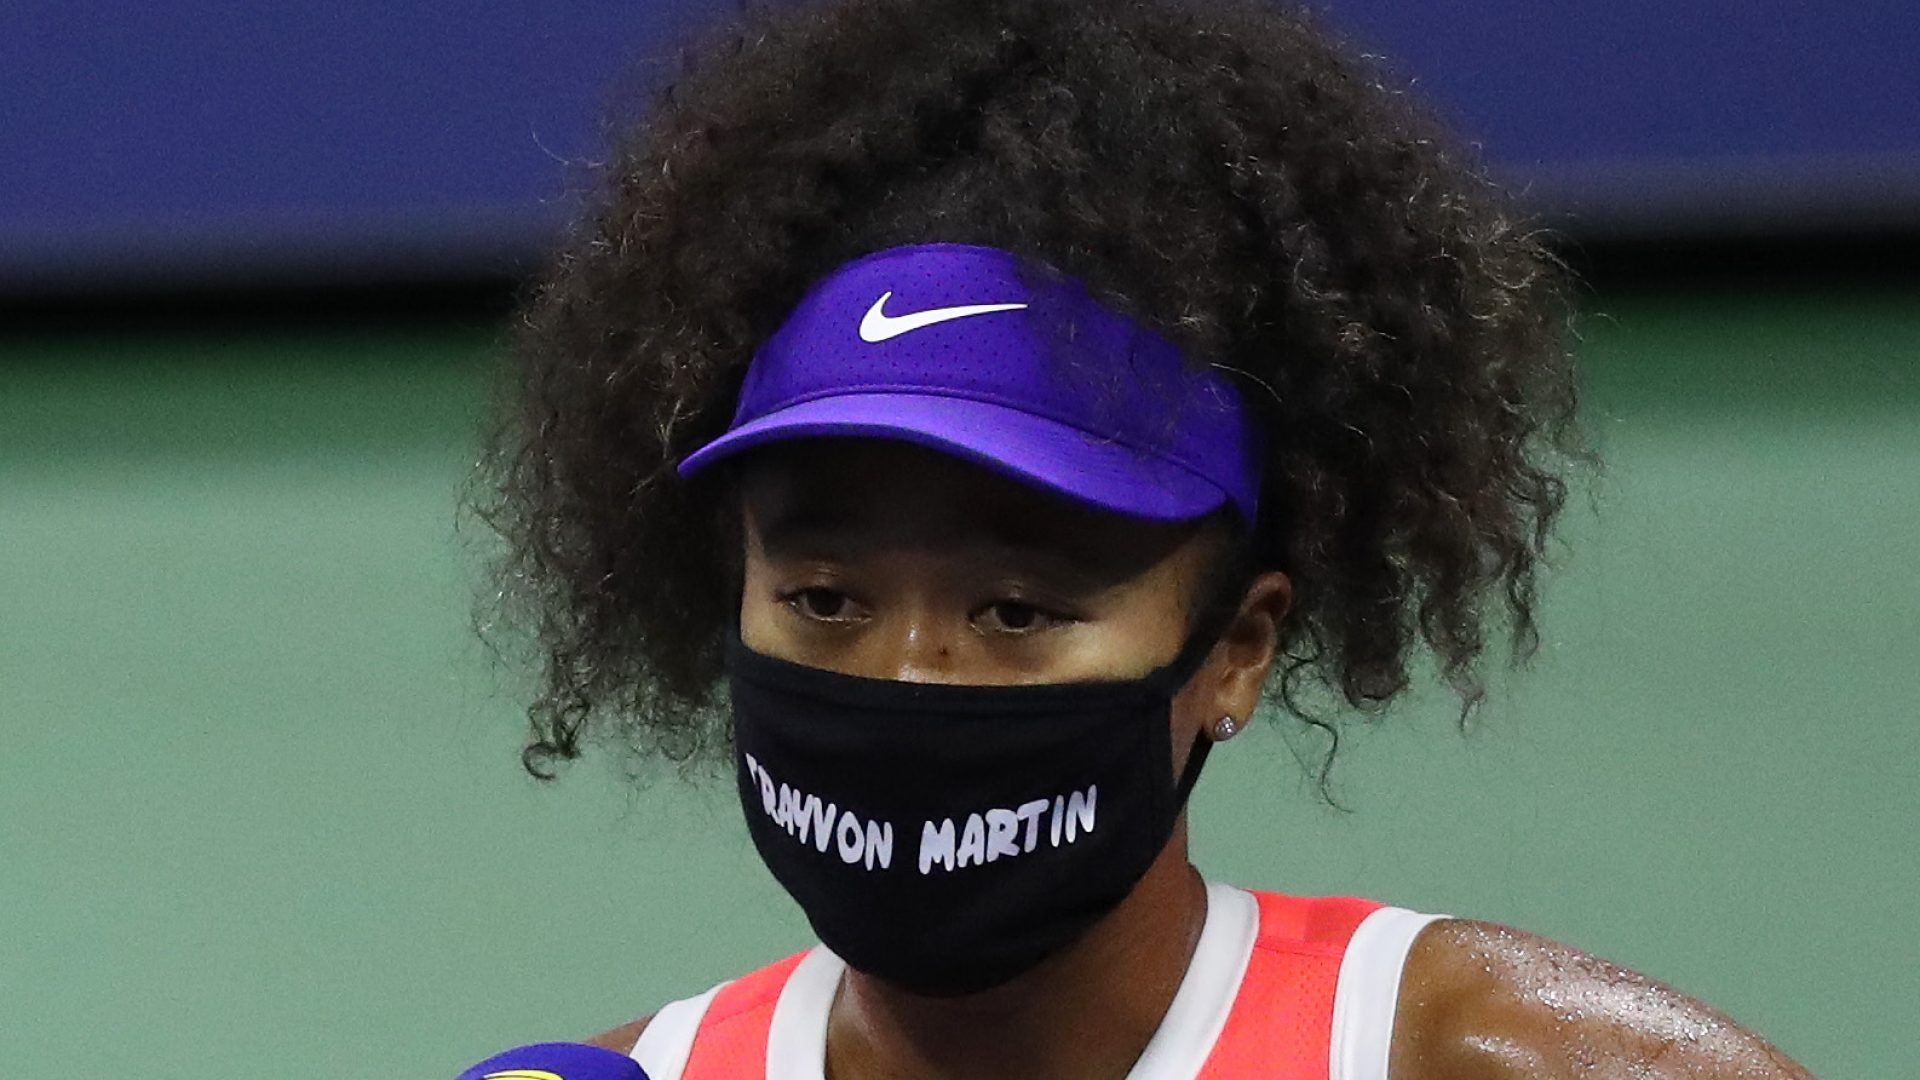 Parents Of Trayvon Martin, Ahmaud Arbery Thank Naomi Osaka For Wearing Masks During U.S. Open